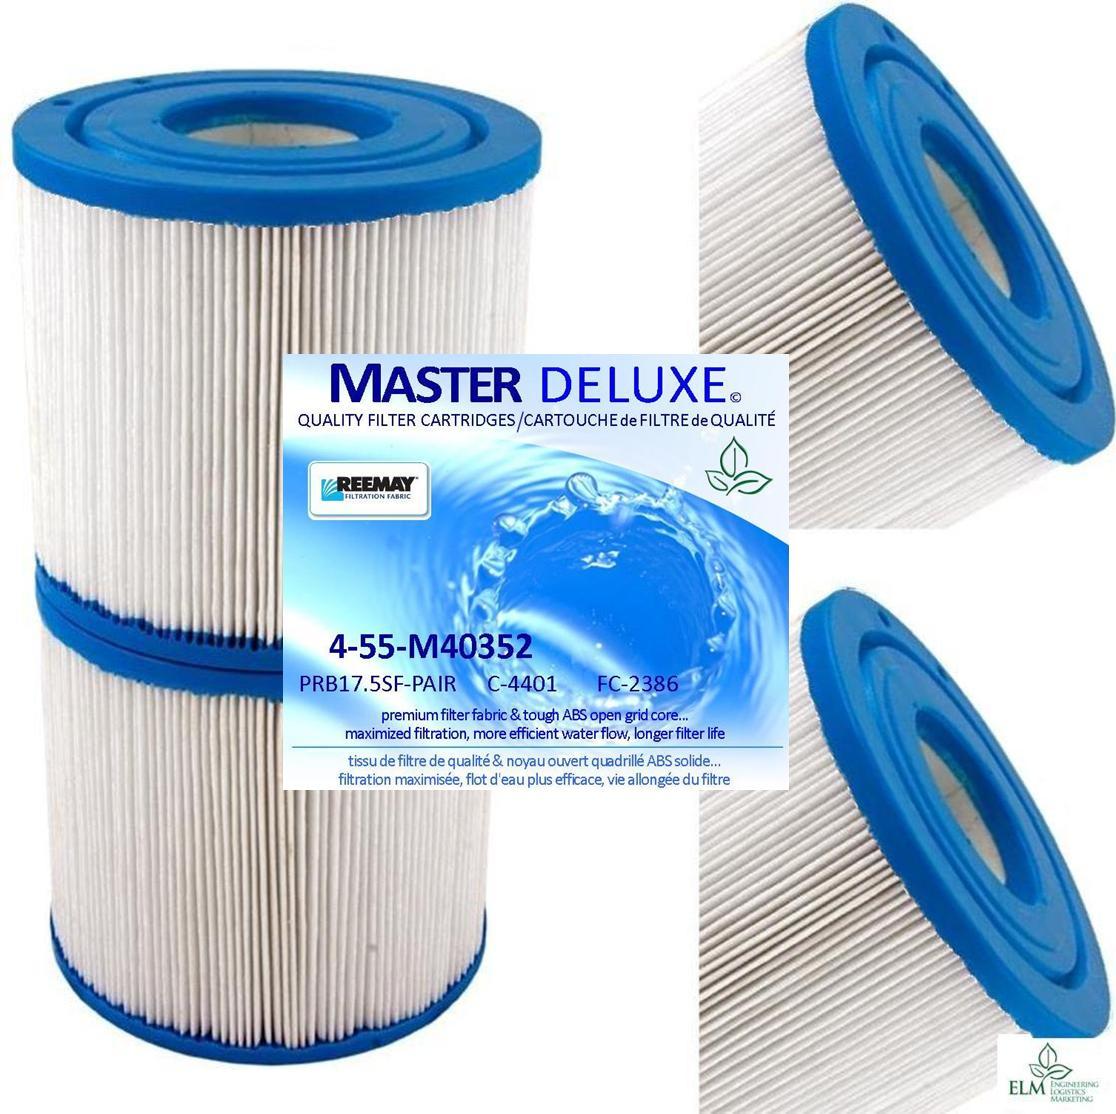 35 sq.ft. Spa Filter PRB17.5SF-PAIR C-4401 FC-2386 M40352